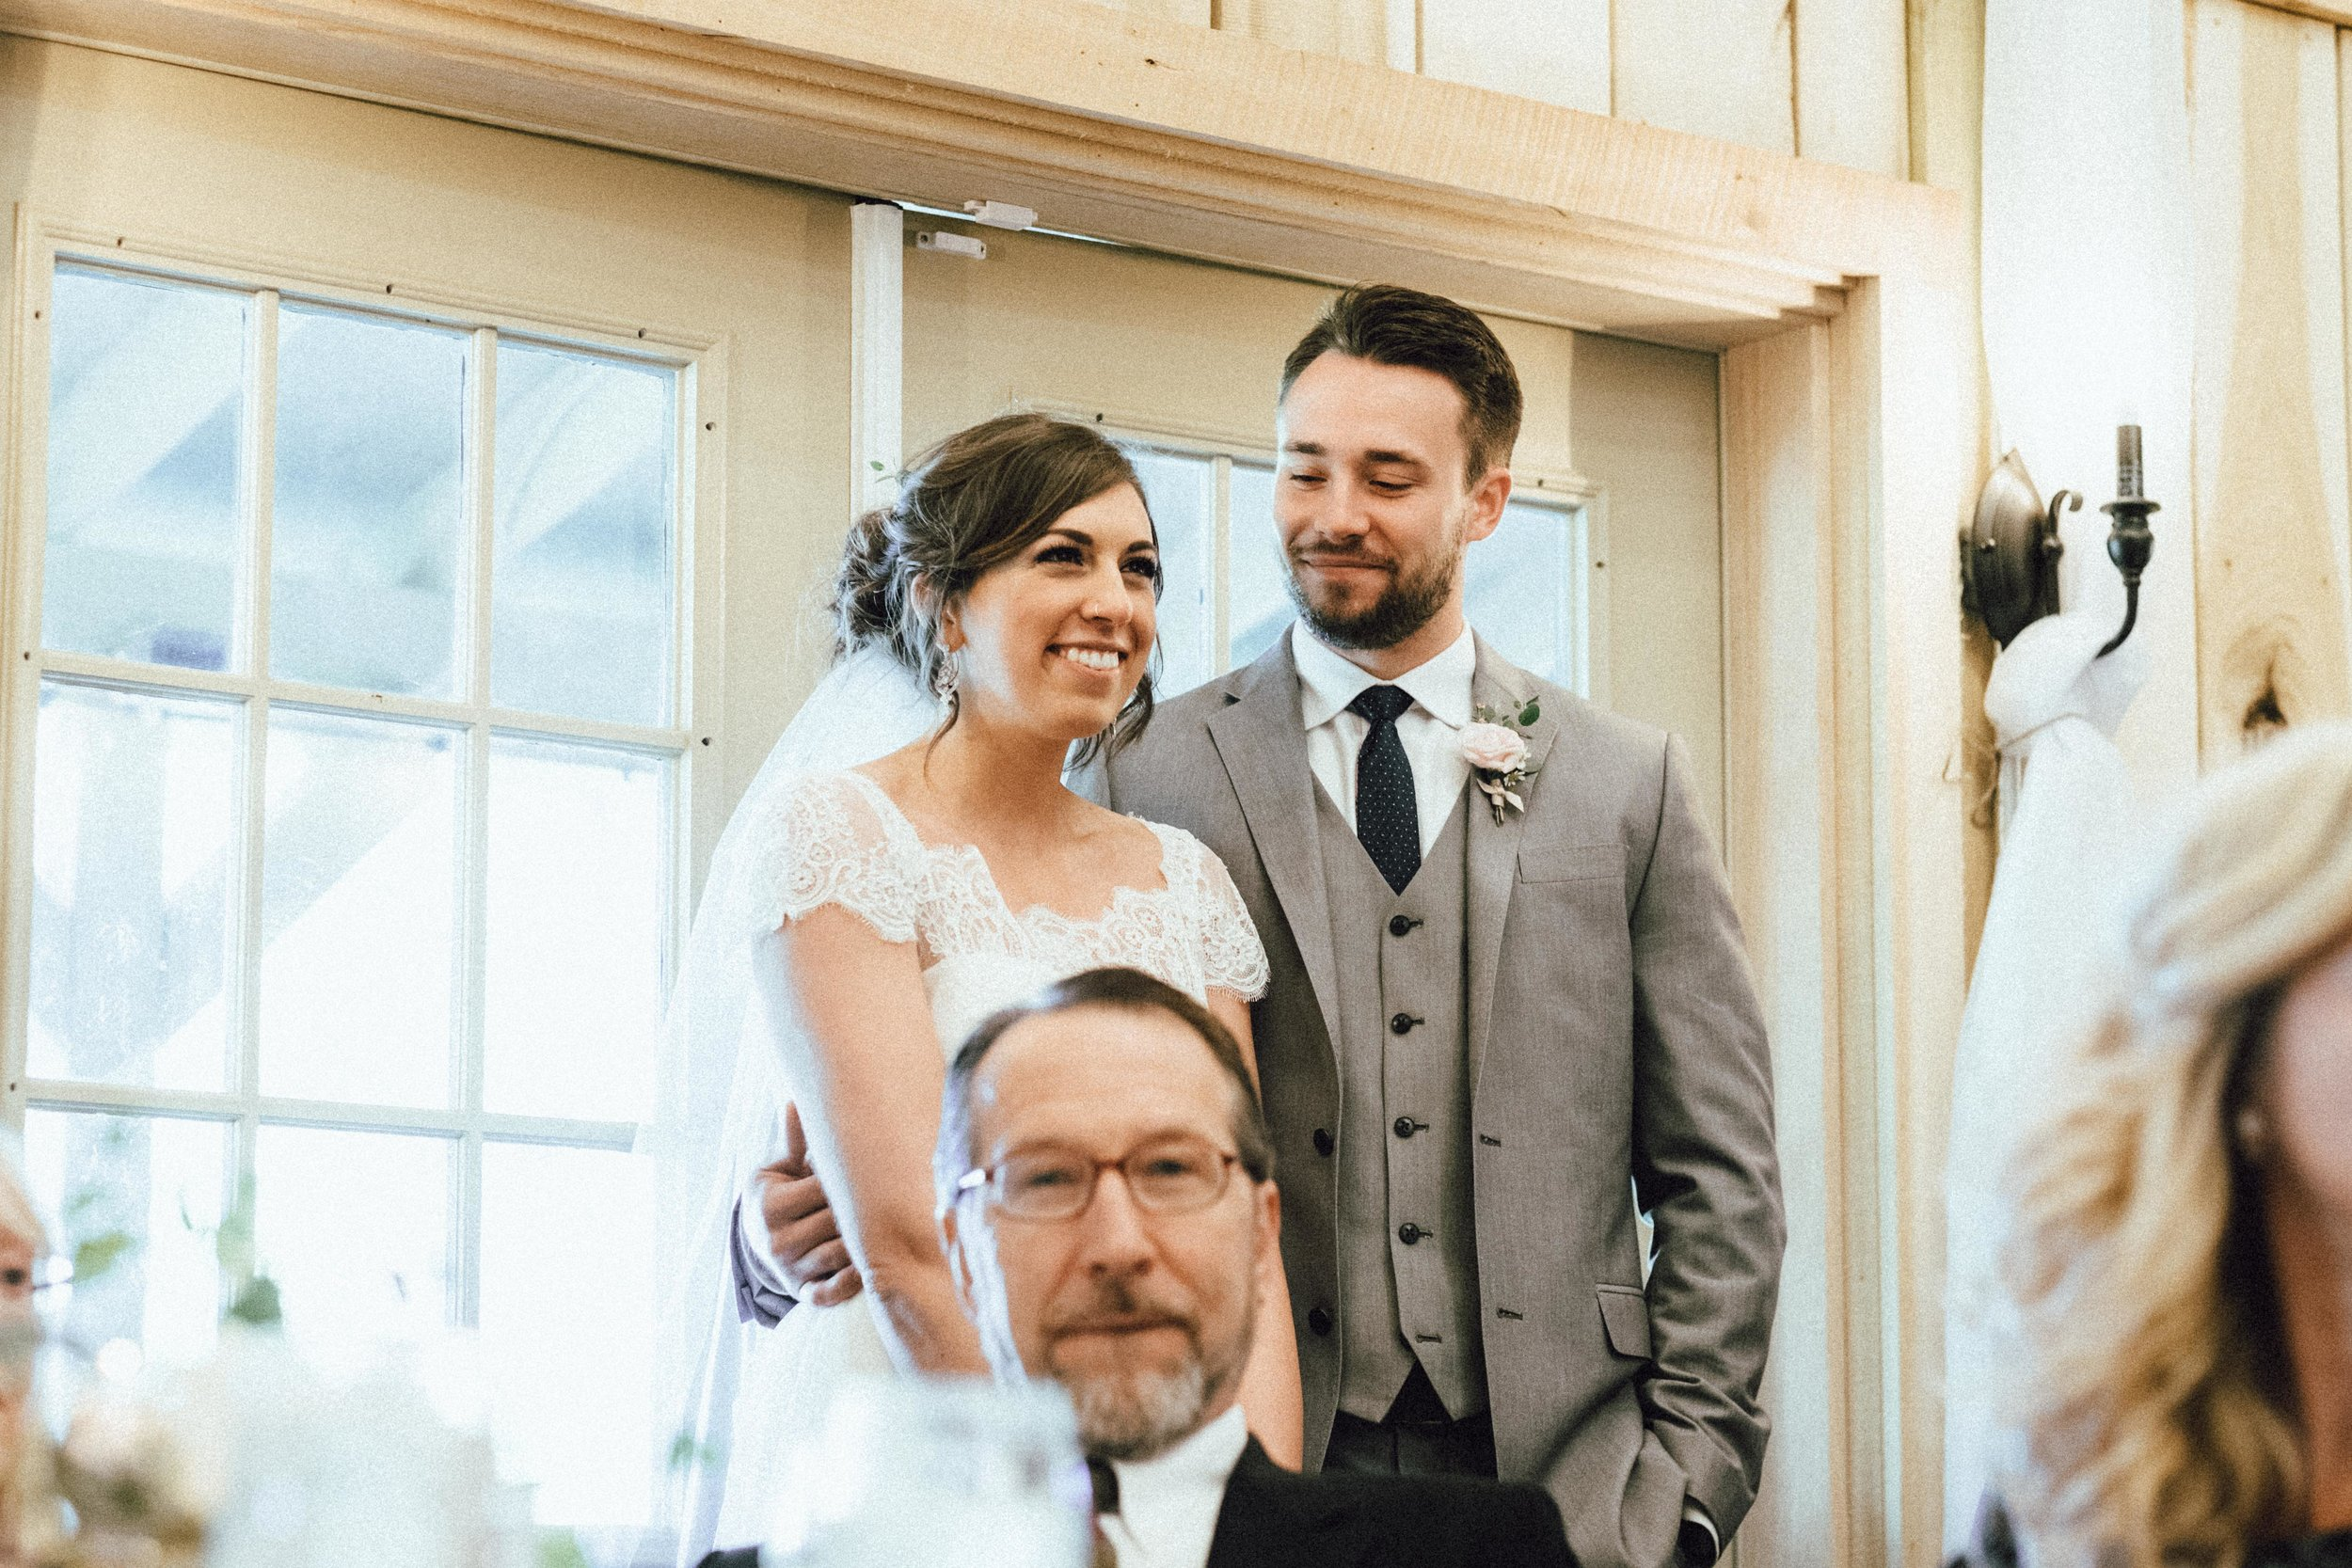 Steph-Ben-Blog-Indianapolis-Wedding-56.jpg